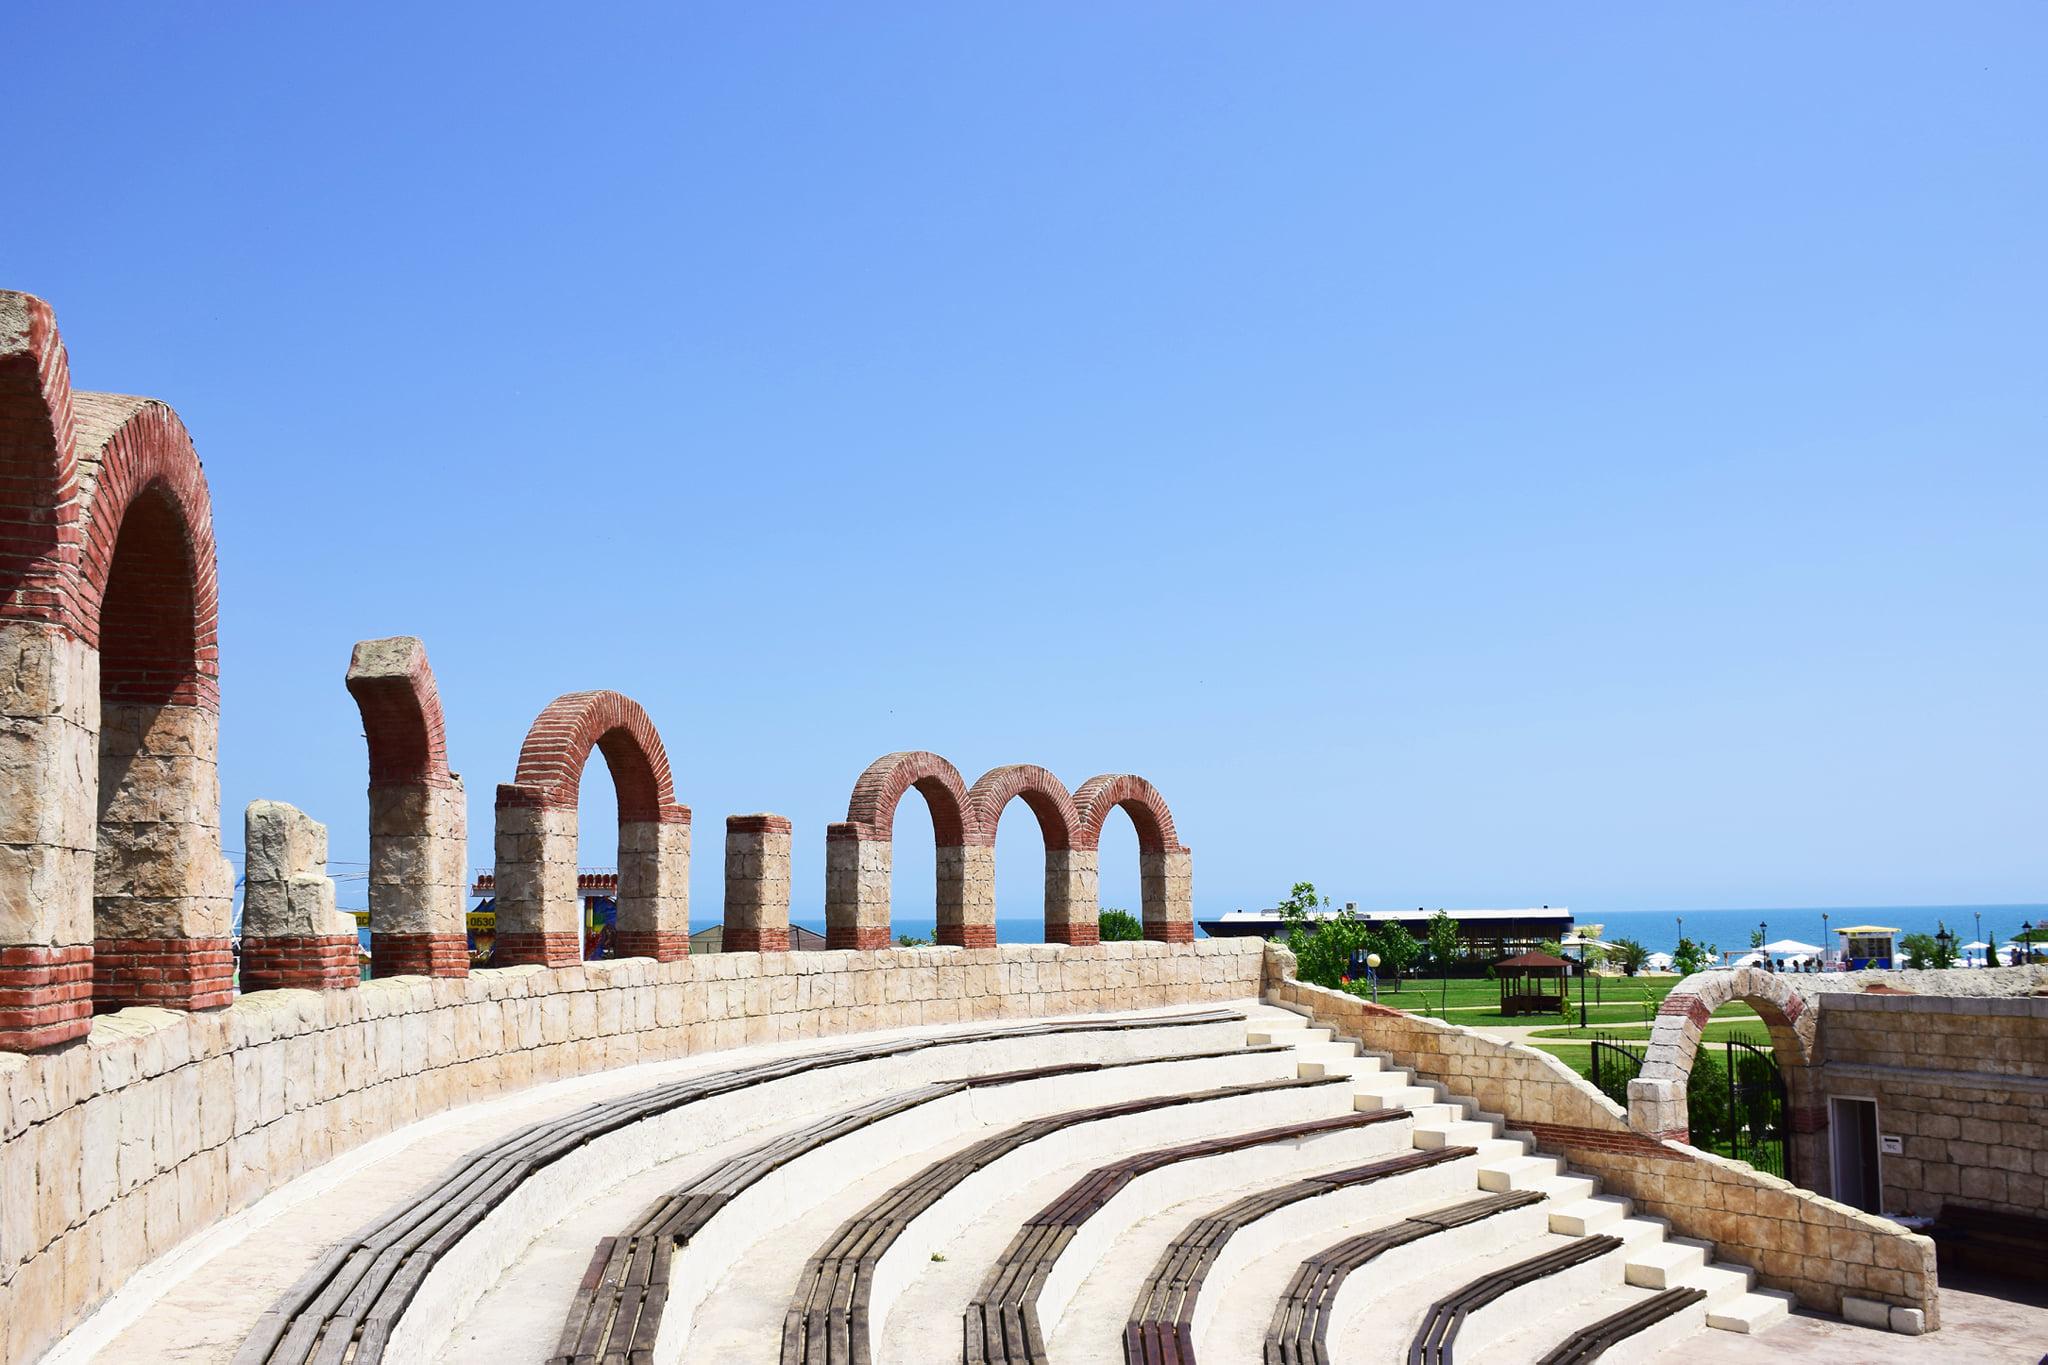 Обзор е лидер в семейния туризъм  с 10 км плаж,  конкурентни цени и древна история